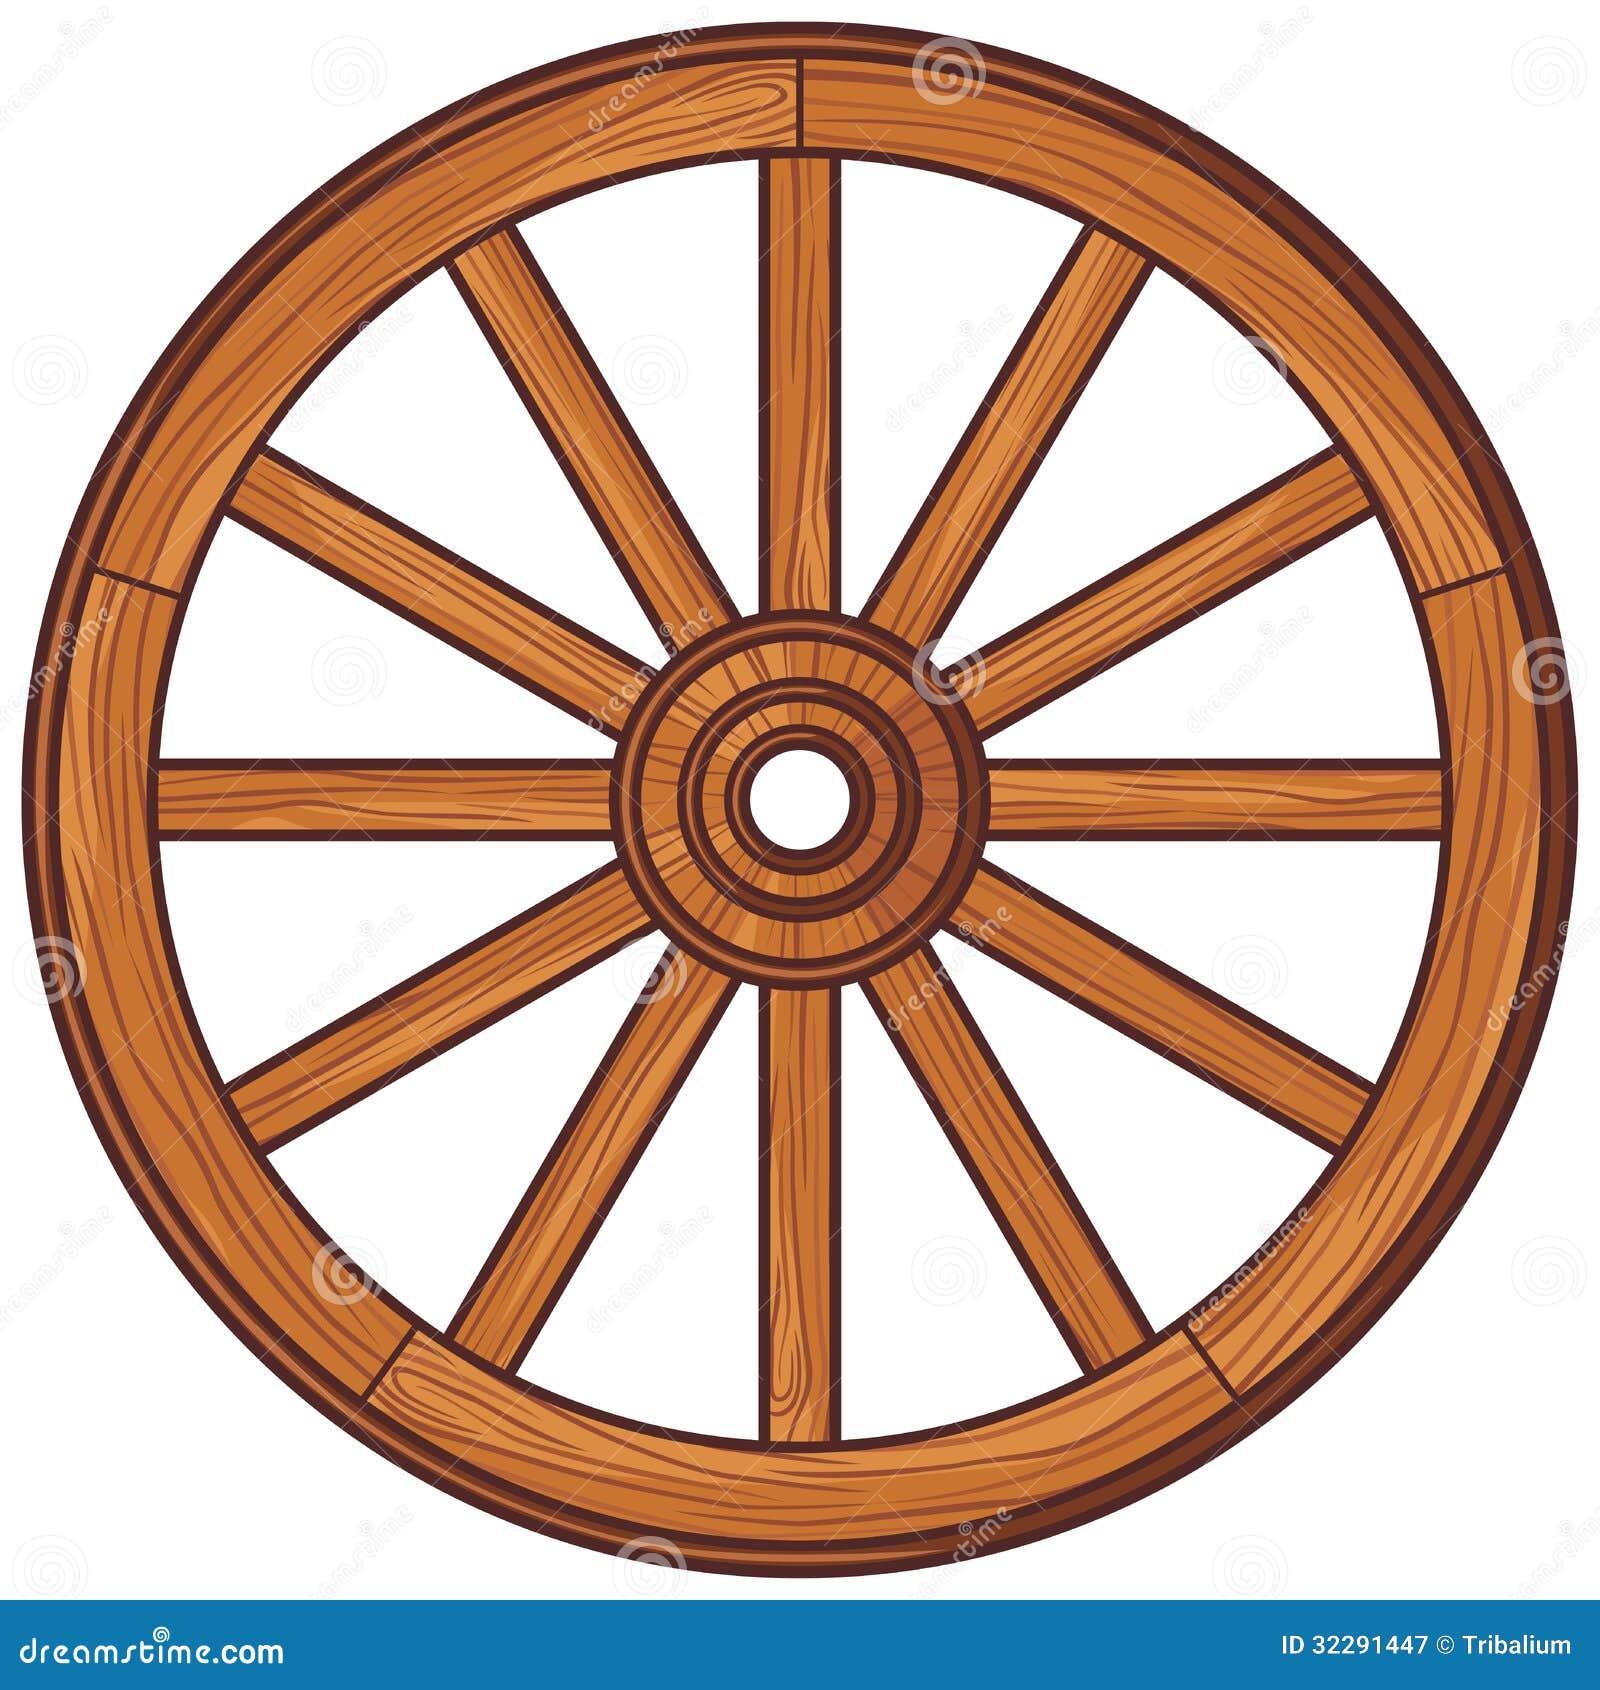 u6728 u8f6e u5b50  u514d u7248 u7a0e u56fe u5e93 u6444 u5f71  u56fe u7247 32291447 wagon wheel clipart black and white wagon wheel clip art for gypsy